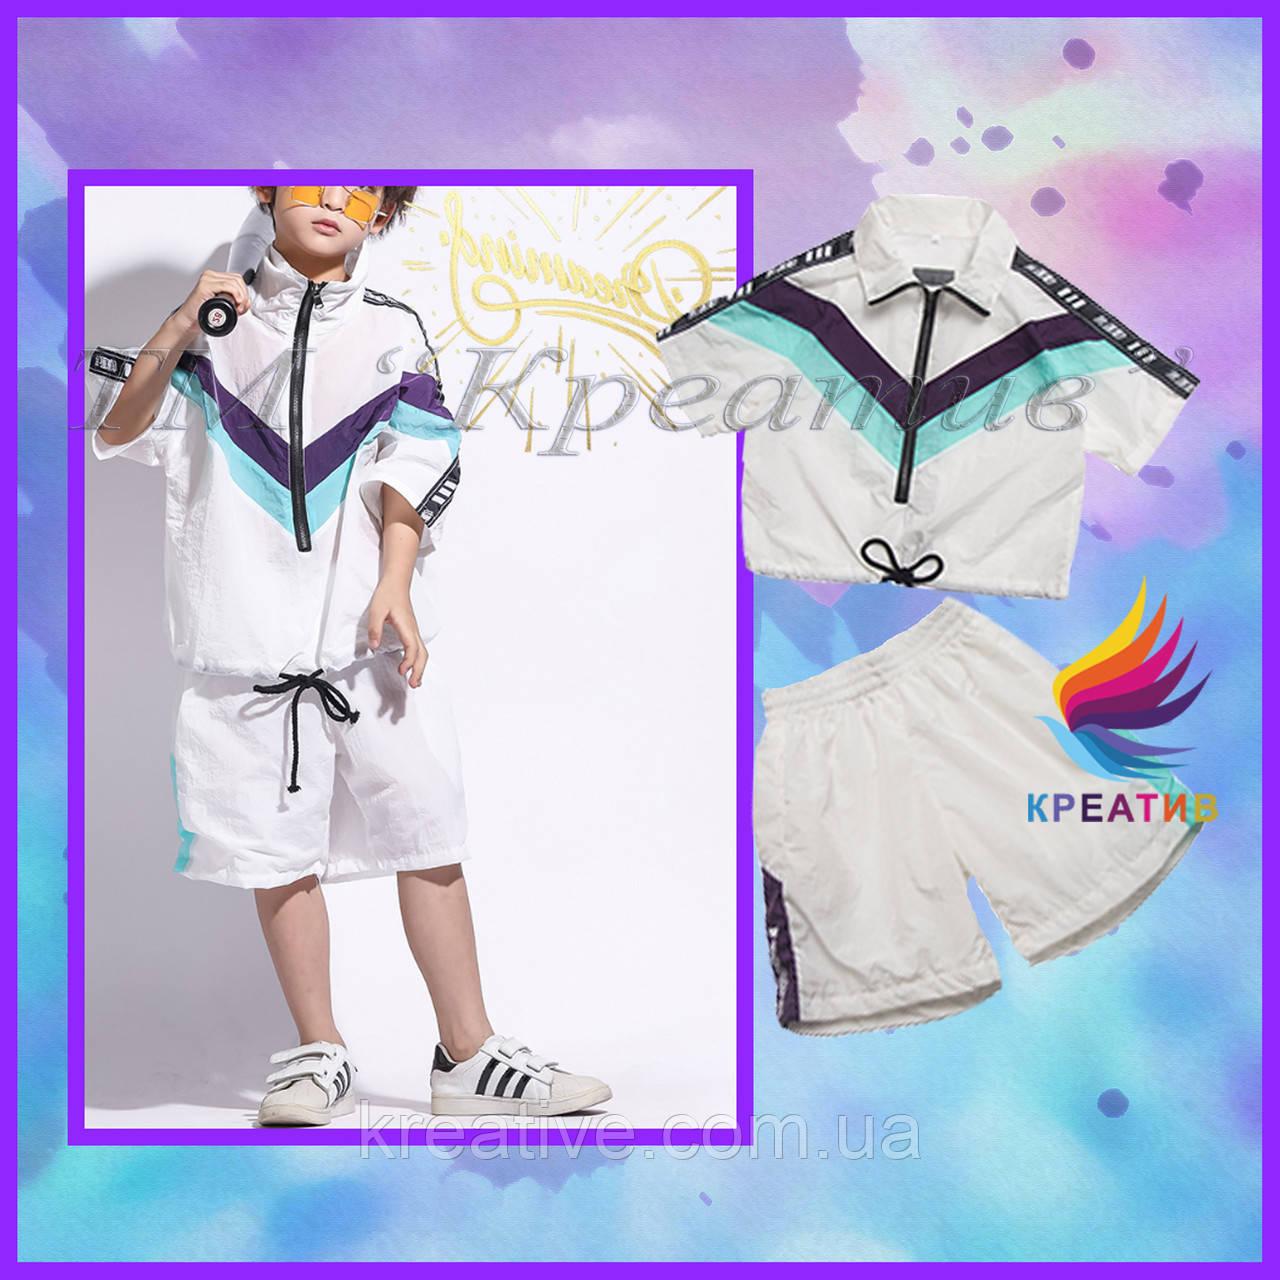 Летний костюм мастерка шорты оптом (под заказ от 50 шт) с НДС